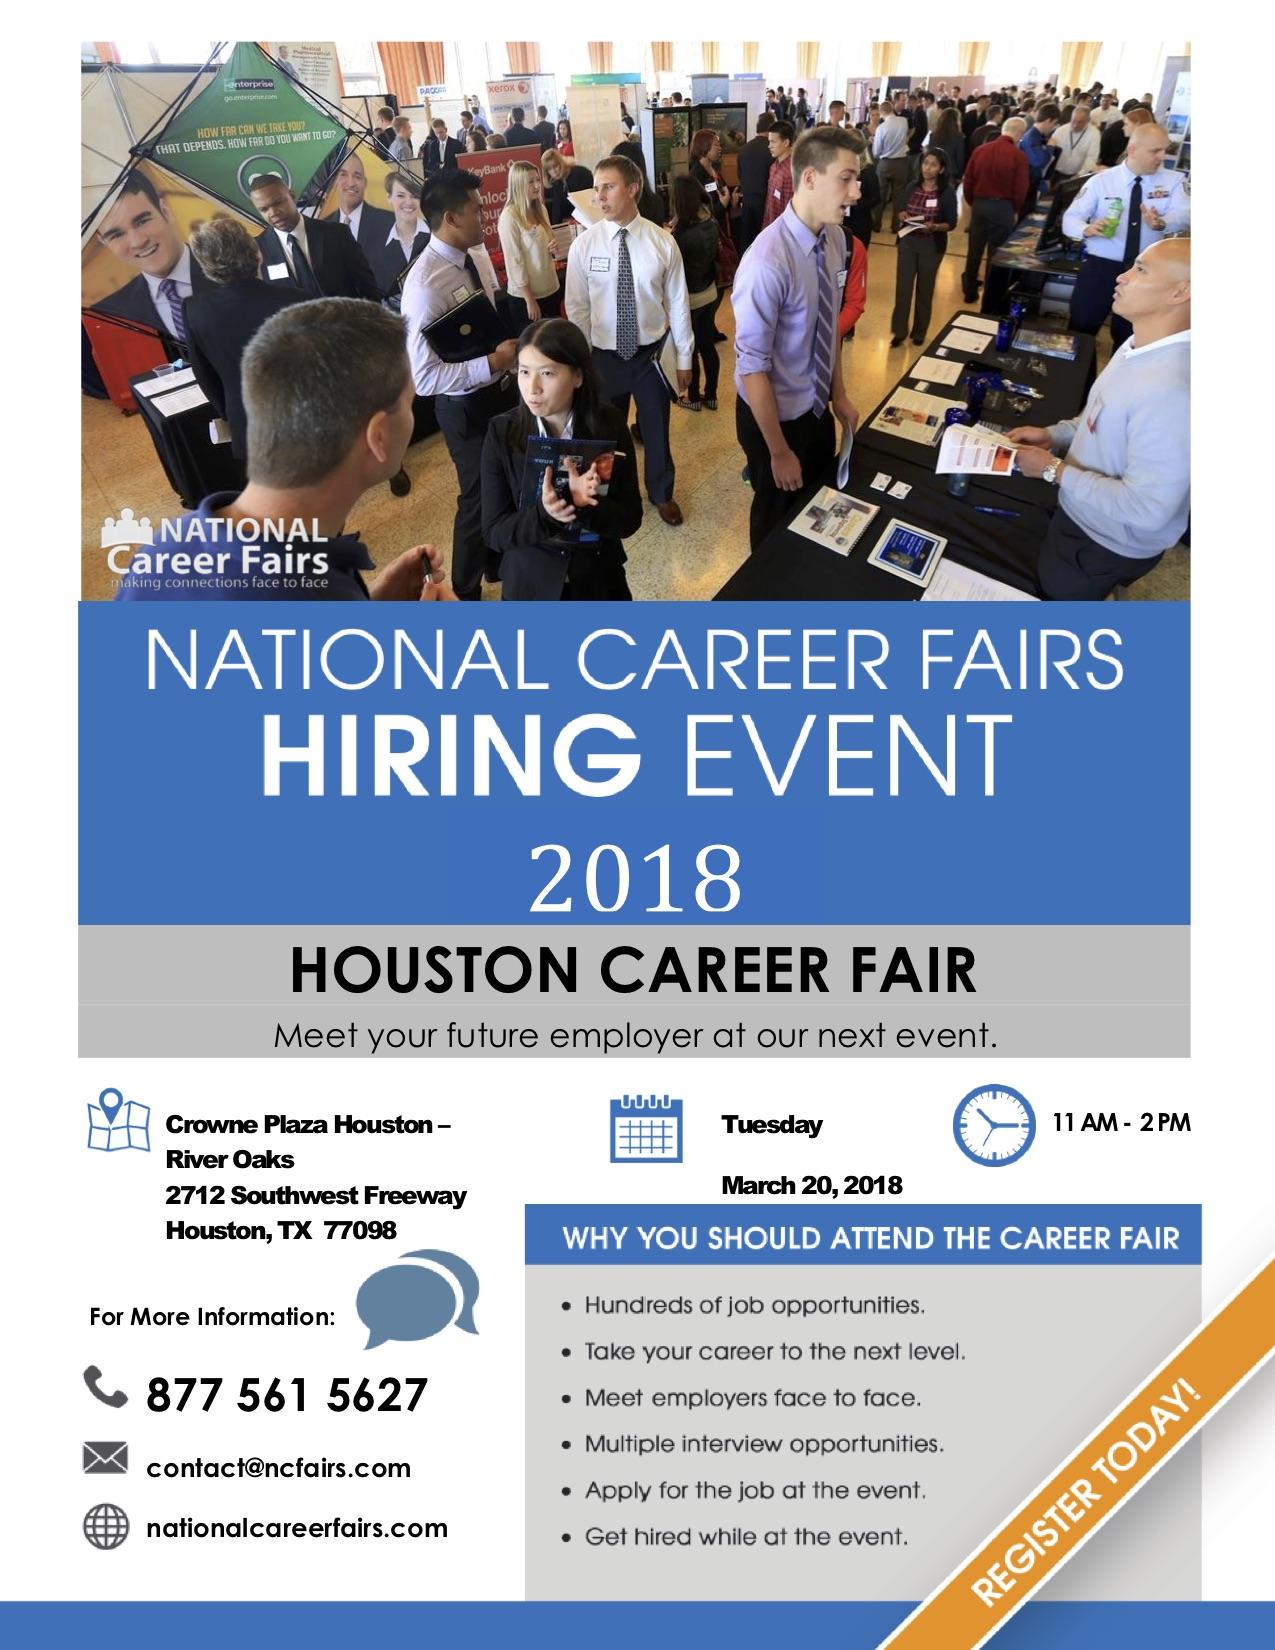 National Career Fairs Houston Hiring Event